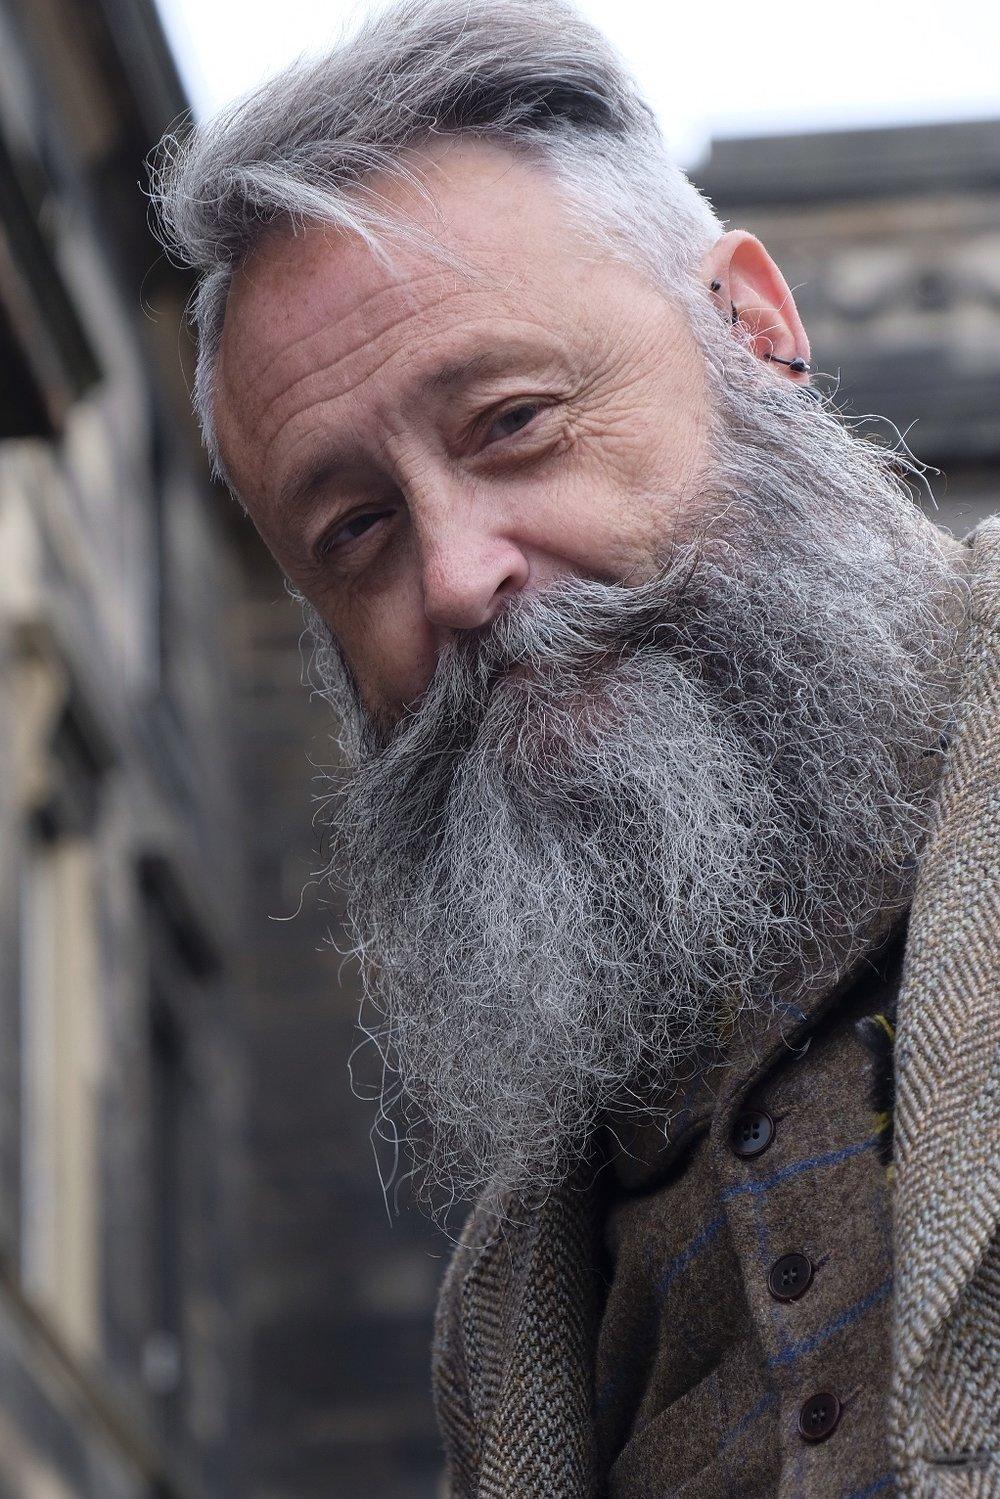 Scottish Beard